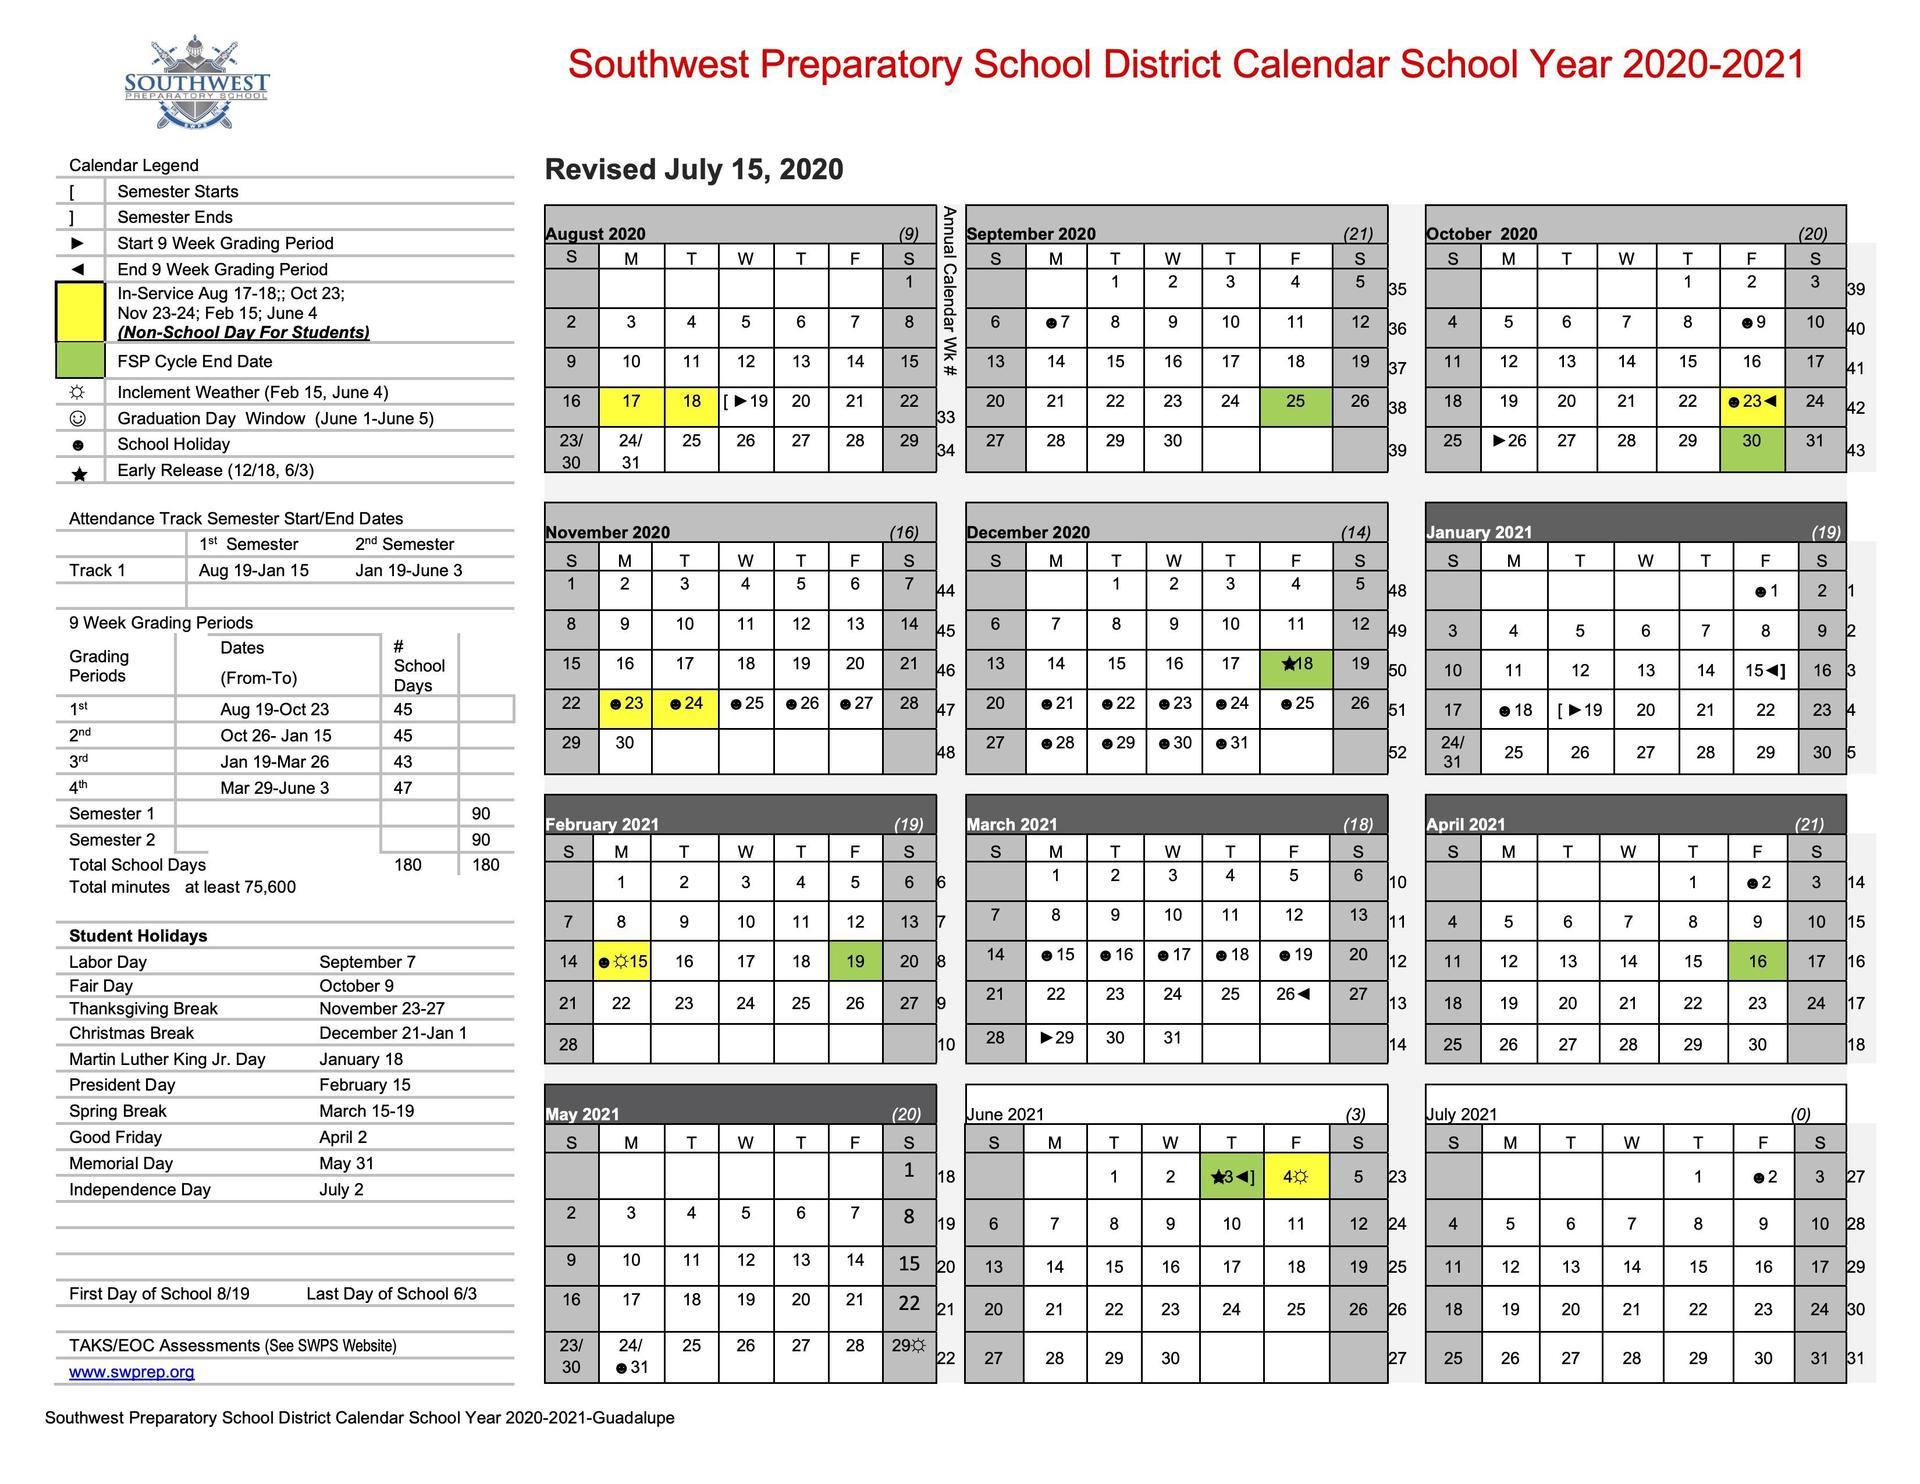 Neisd 2022 23 Calendar.San Antonio School Calendars And Covid Resources Updated For 2020 2021 San Antonio Charter Moms